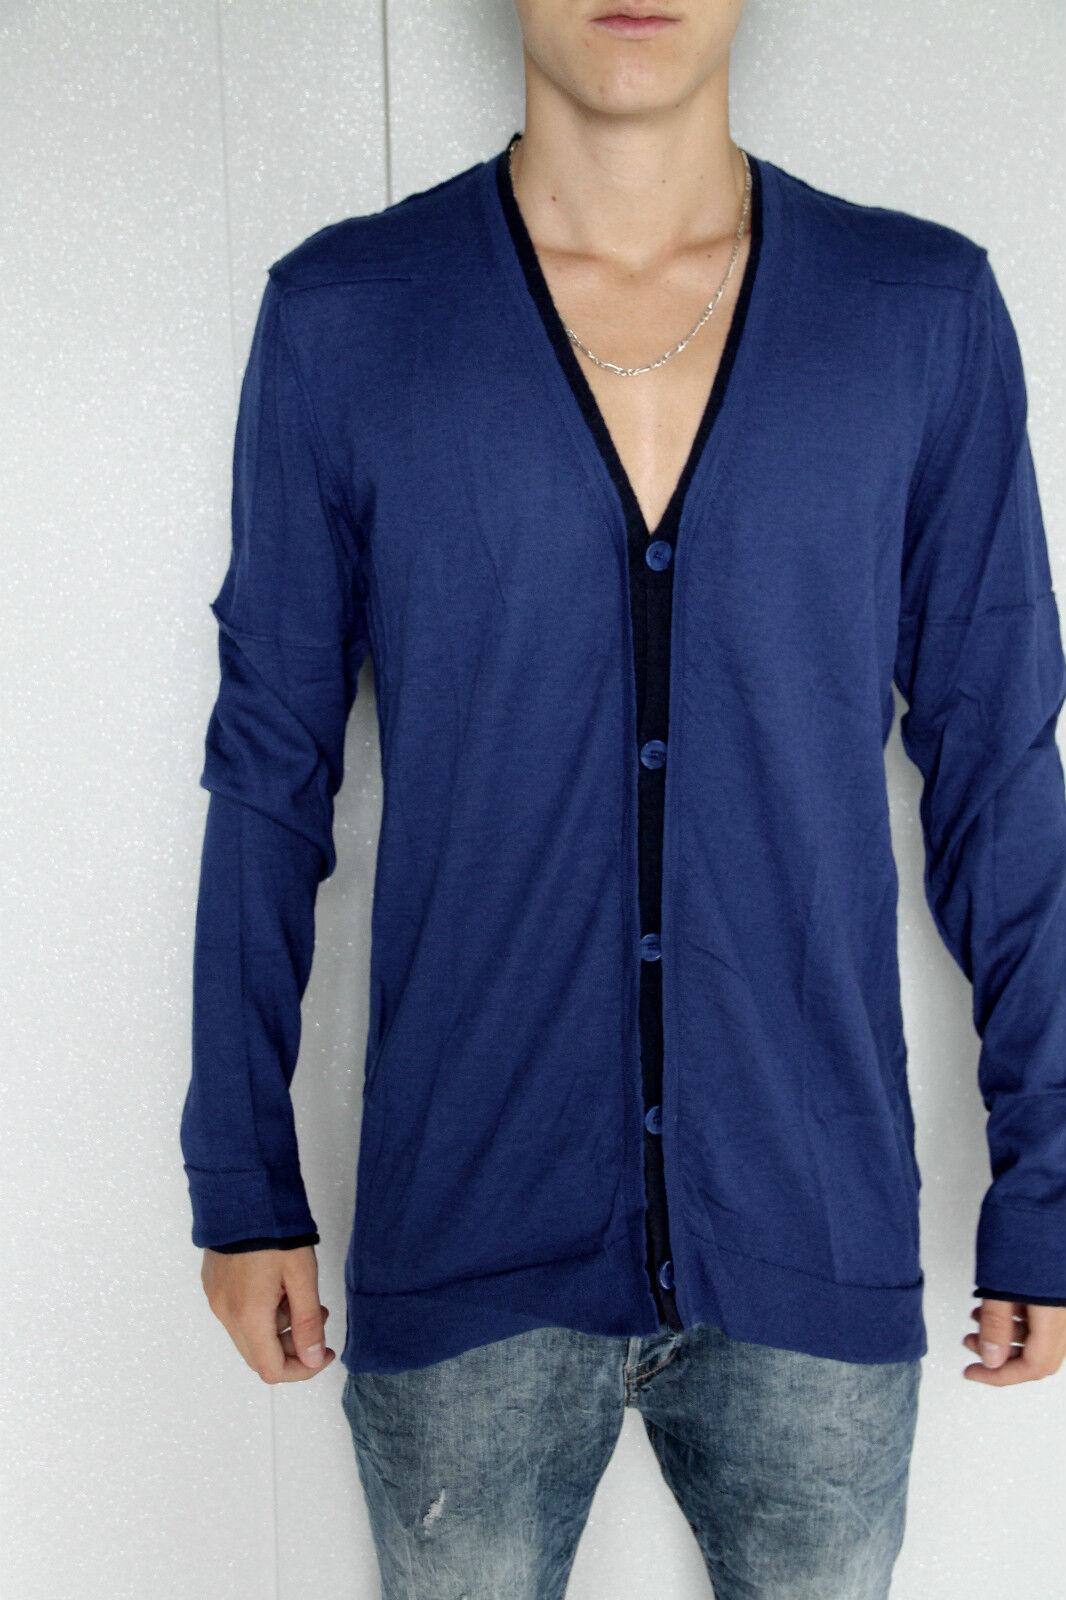 Vest Blau angora merino extra fine m+ F GIRBAUD T XXL NEW/LABEL val